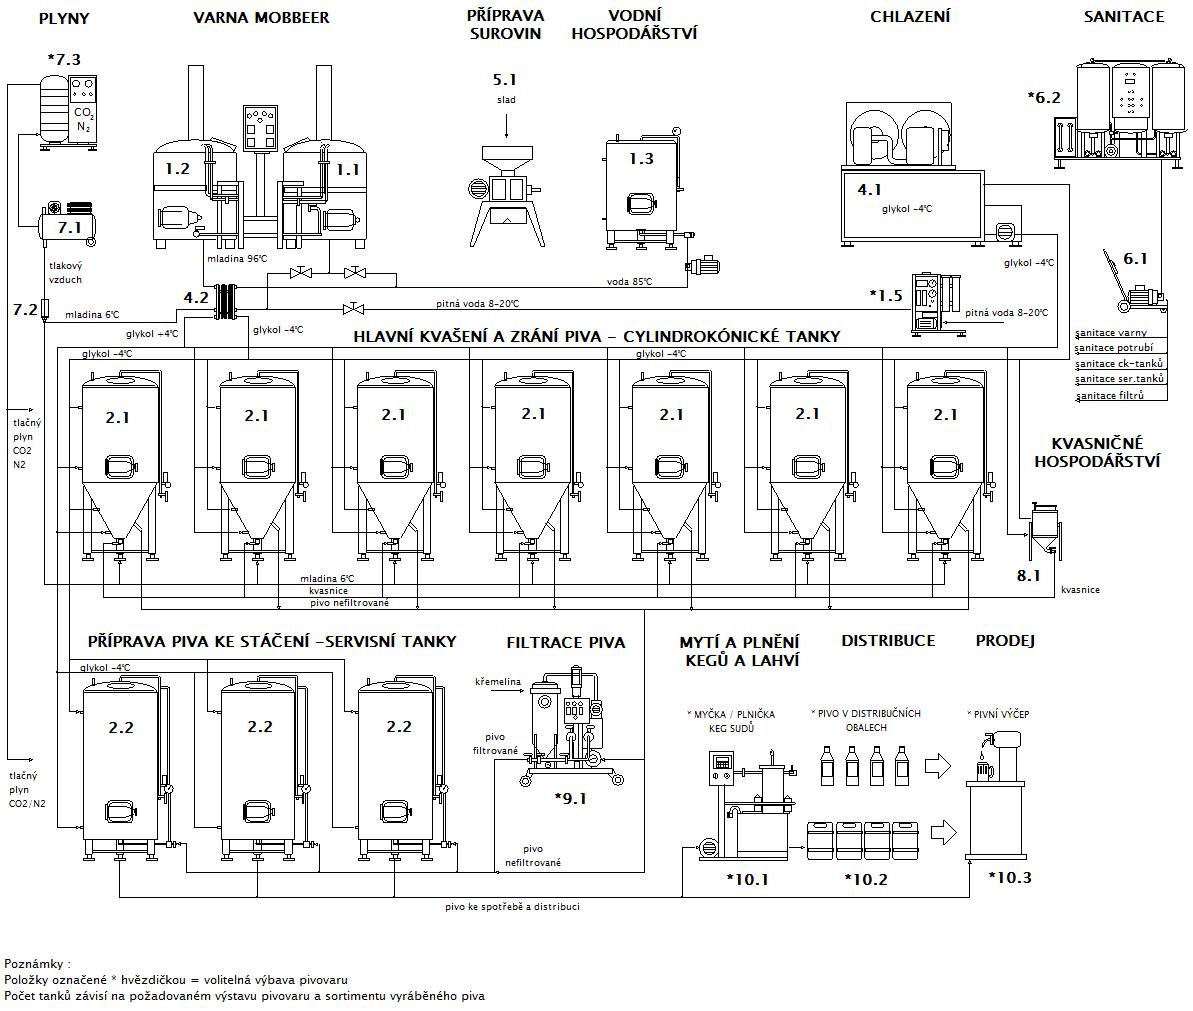 Blokové schéma minipivovaru MOBBEER CF